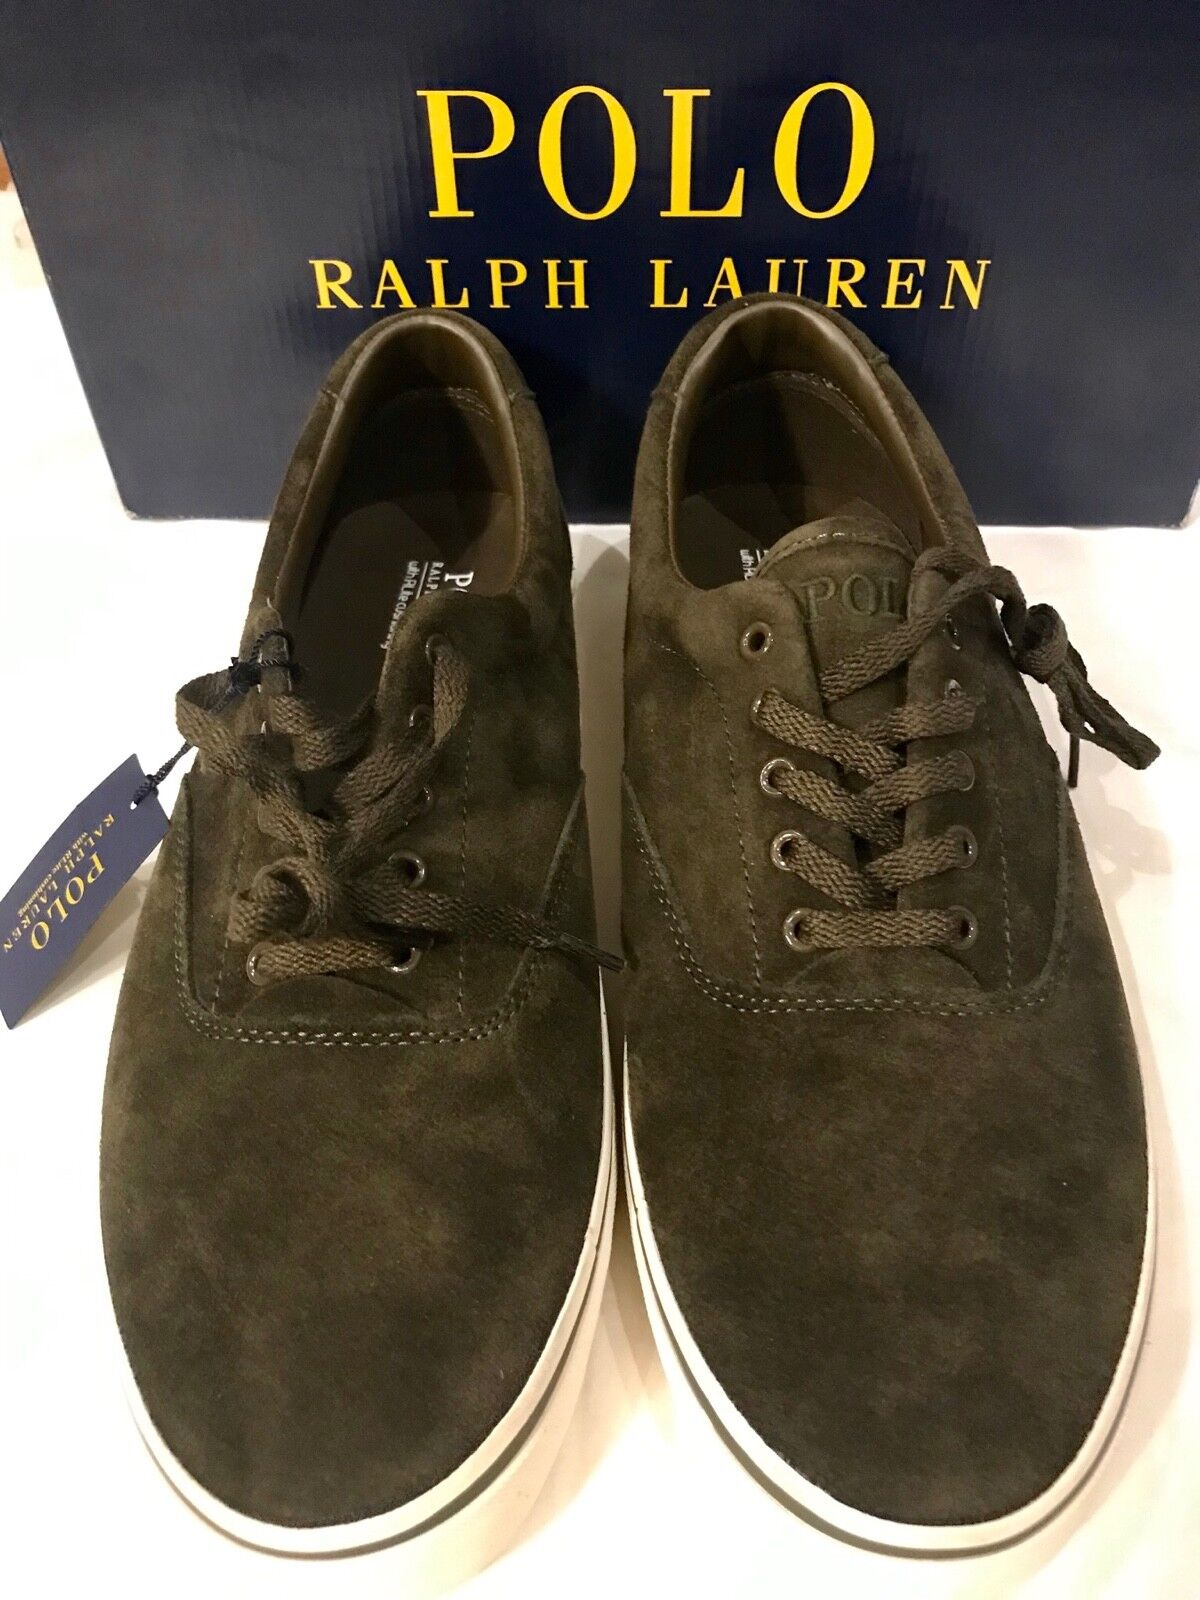 POLO RALPH LAUREN SILKY SUEDE GREEN SIZE  9